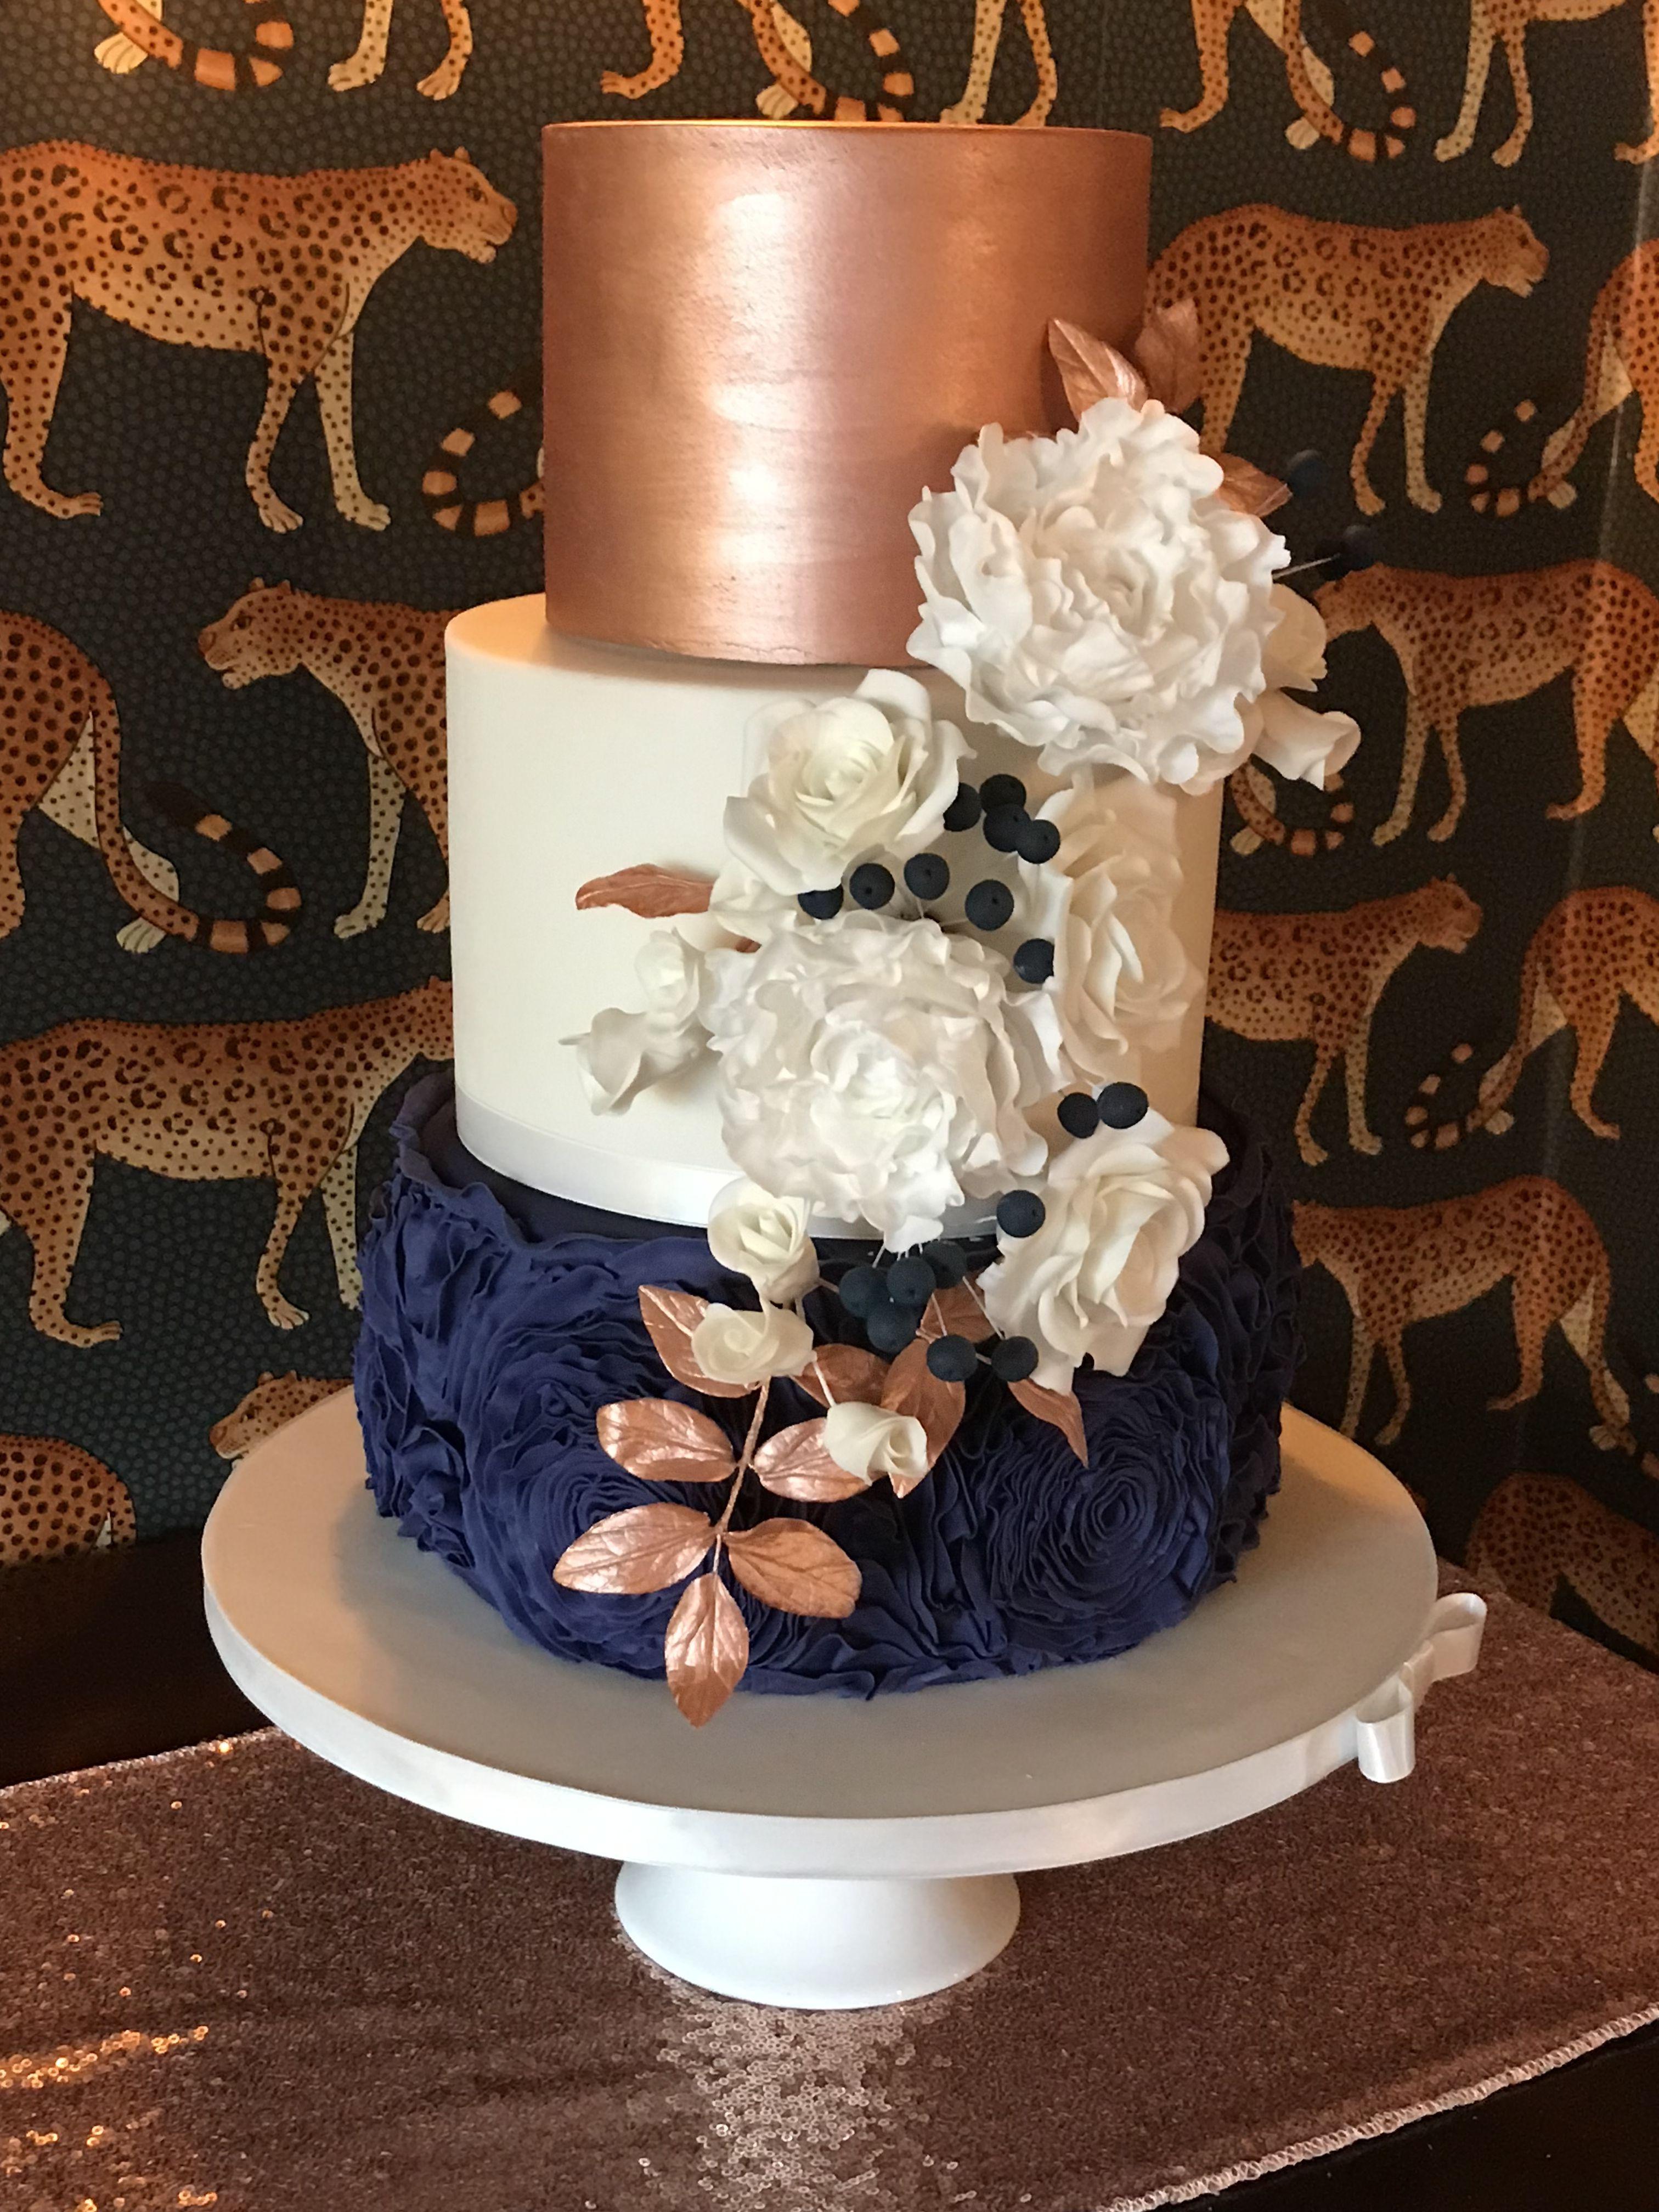 Rose gold and navy blue wedding cake, coordinating sugar flowers -   14 wedding Rose Gold cake ideas